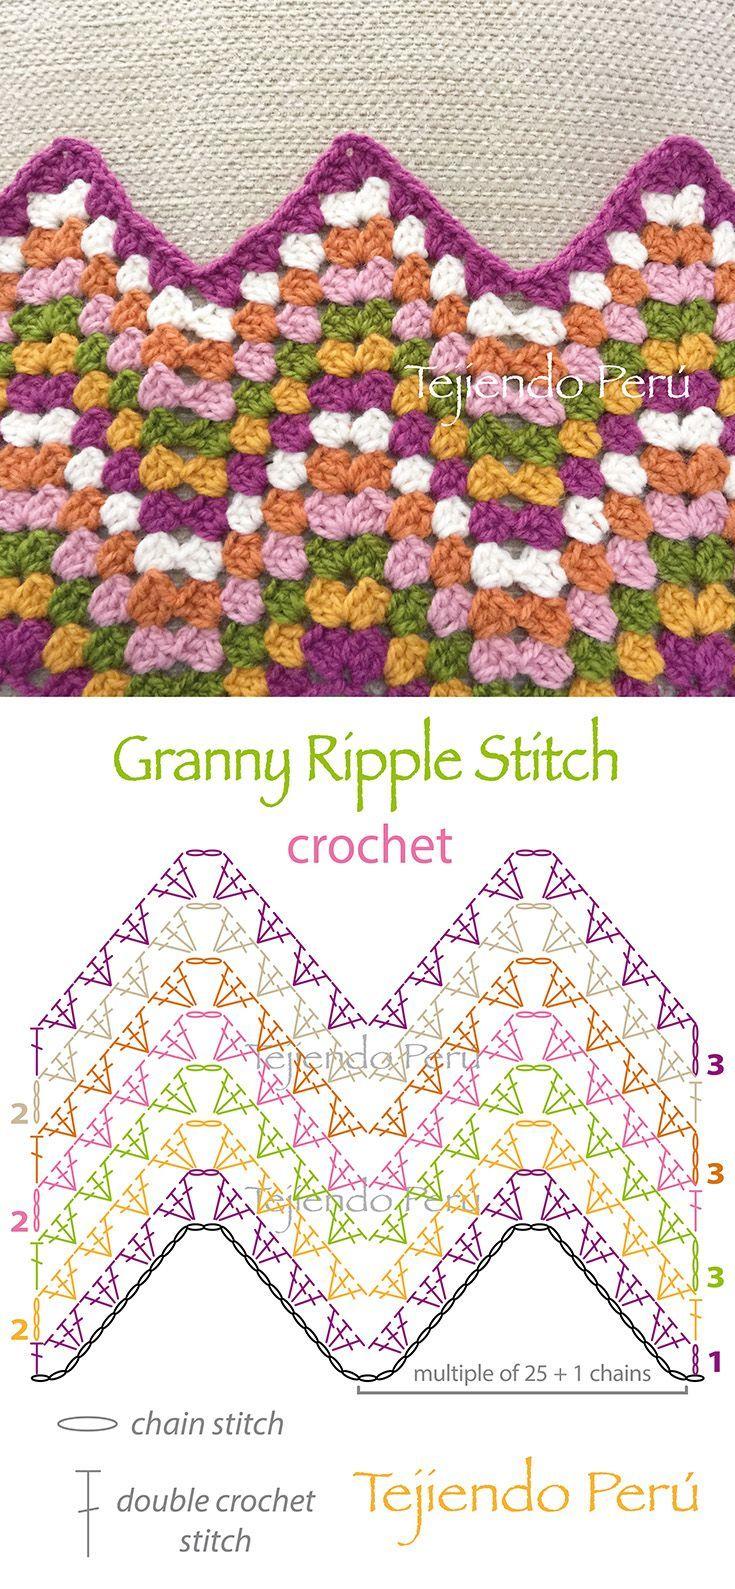 crochet doily patterns with diagram directv genie wiring diagrams great installation of granny ripple stitch or pattern easy rh pinterest com blanket